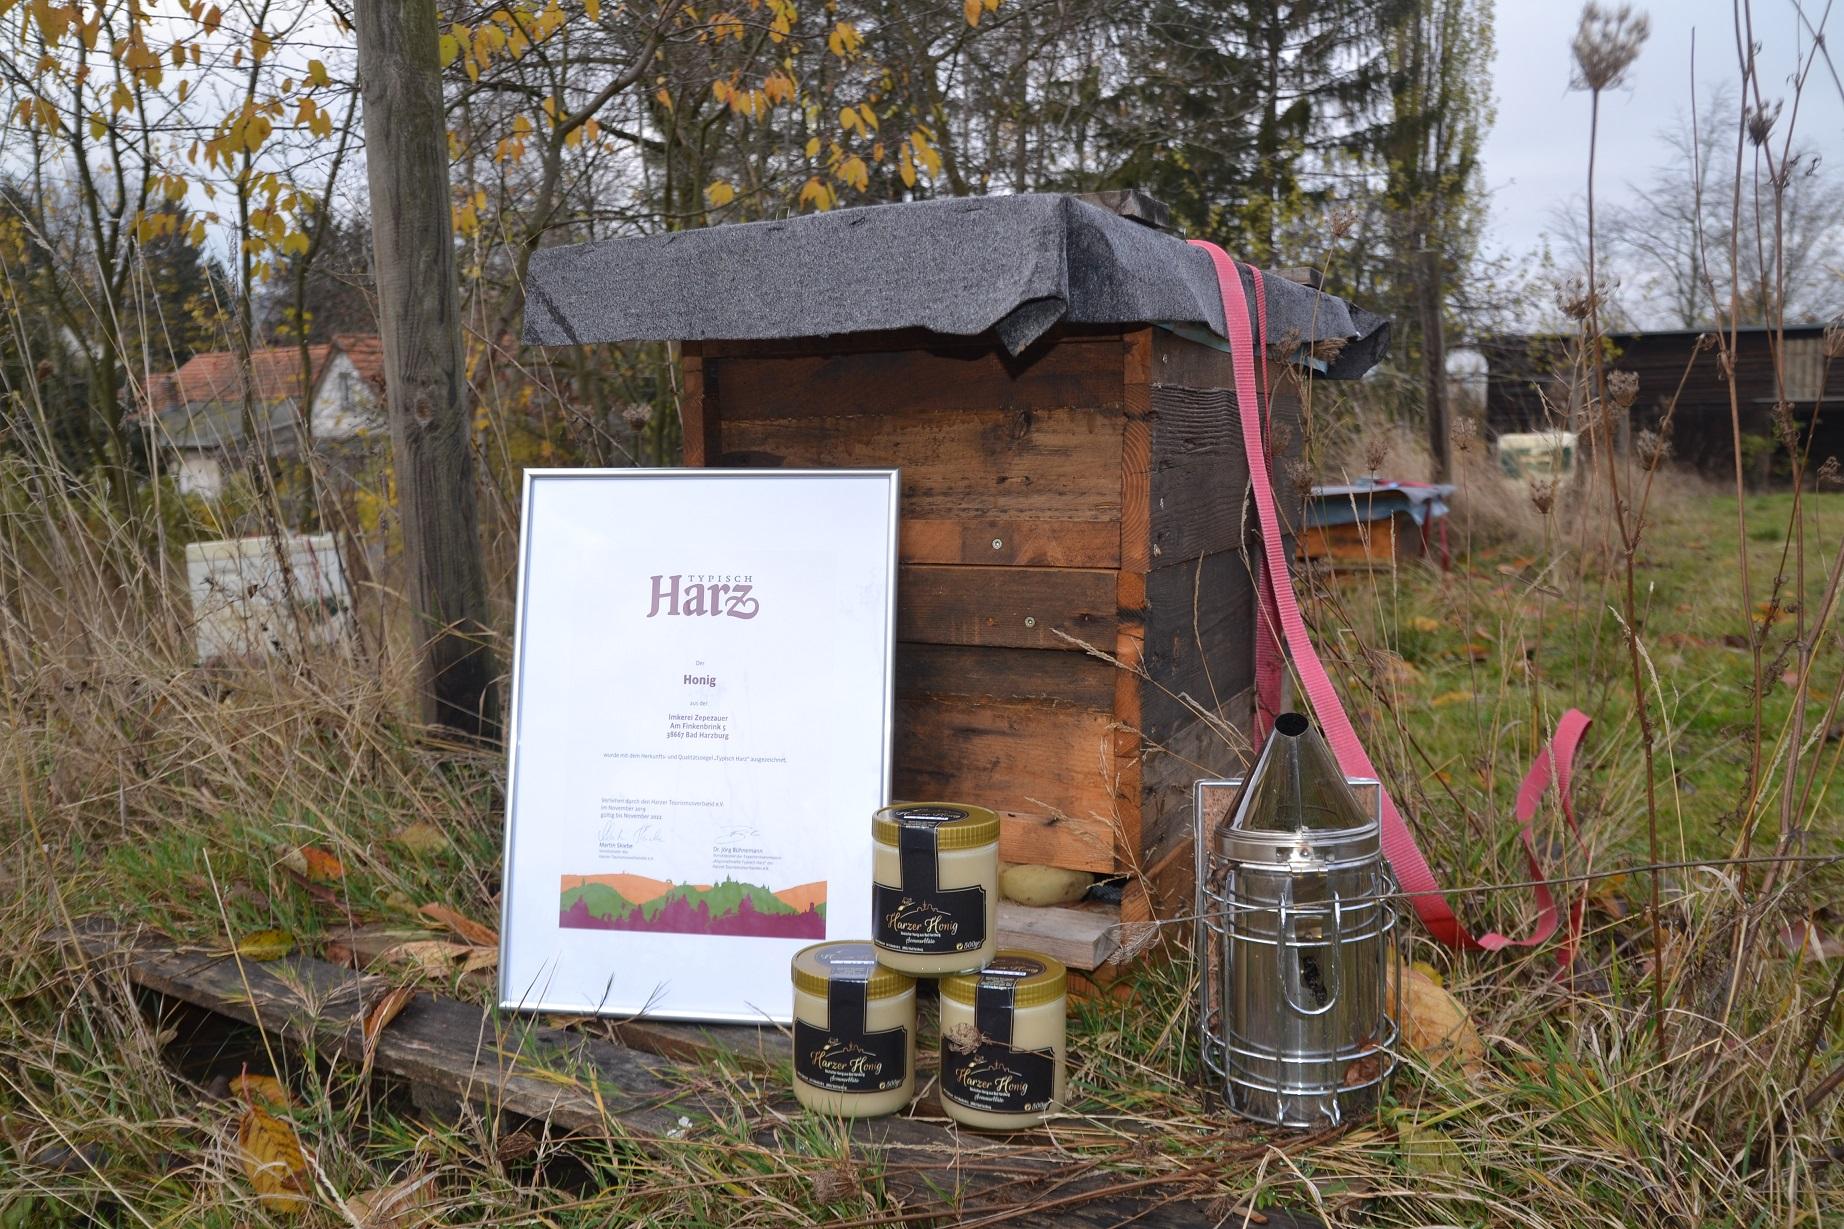 Imker Zepezauer - Herbststimmung am Butterberg